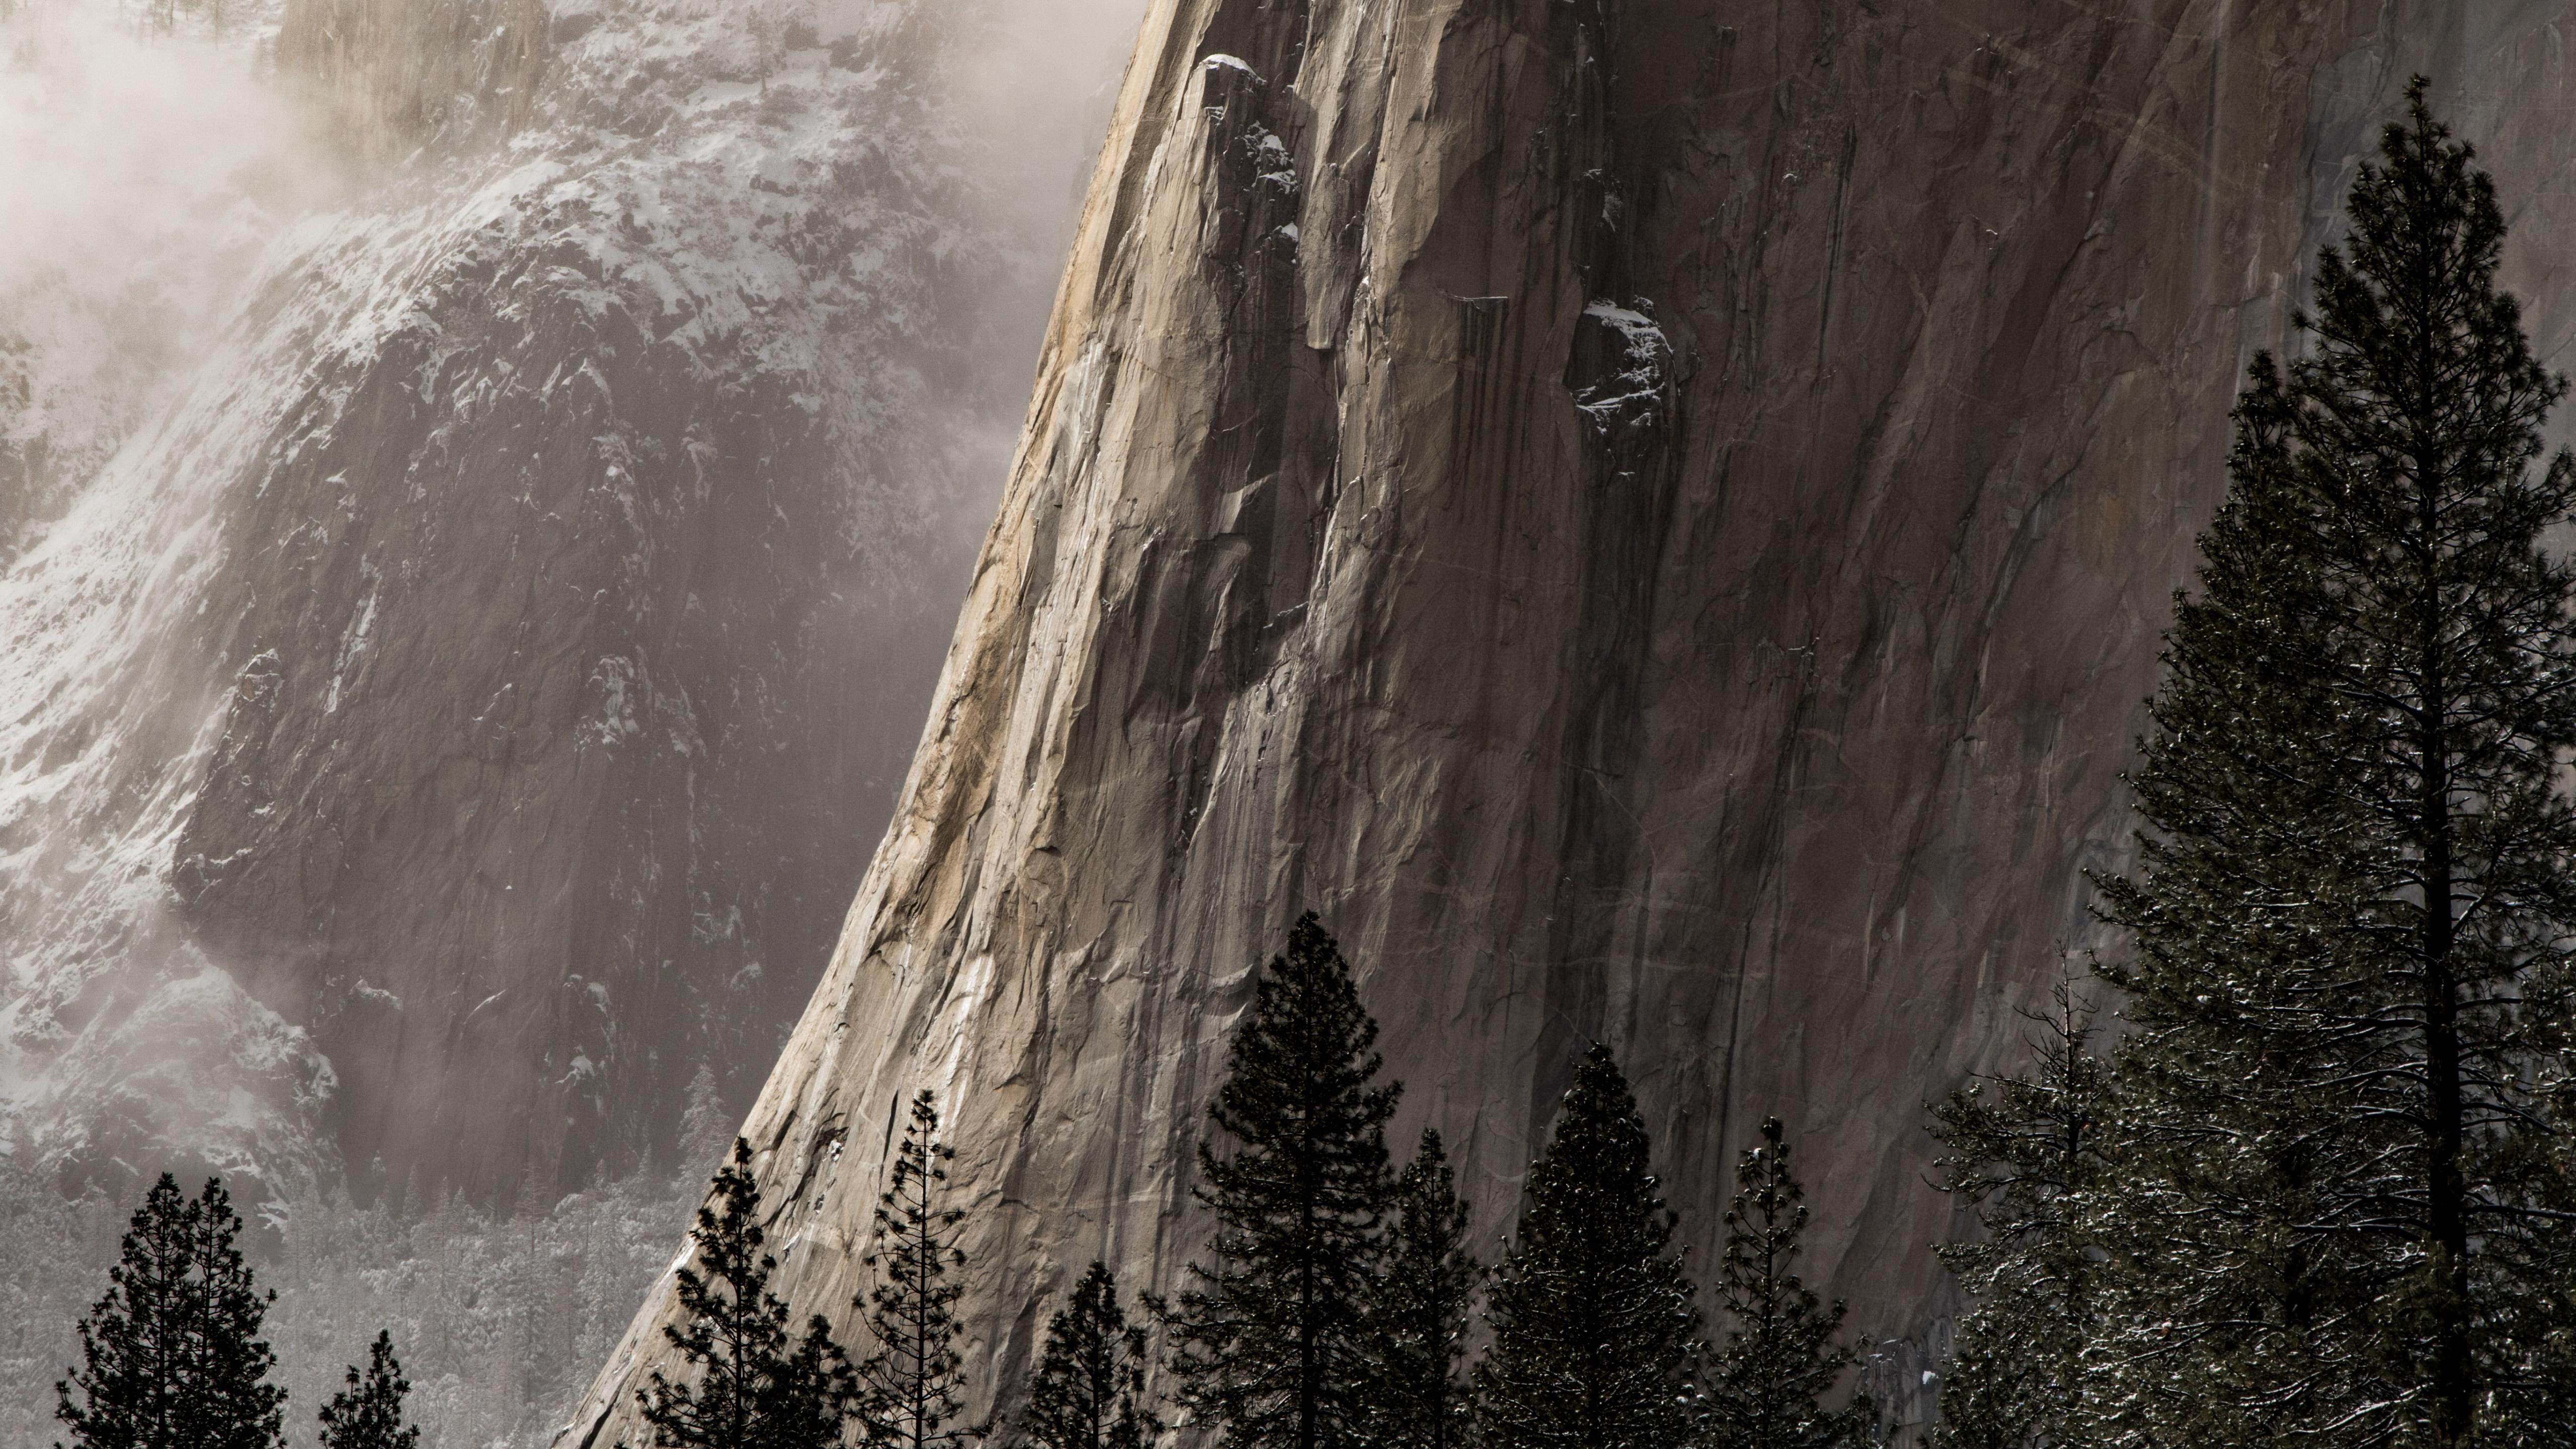 Yosemite Valley wallpaper